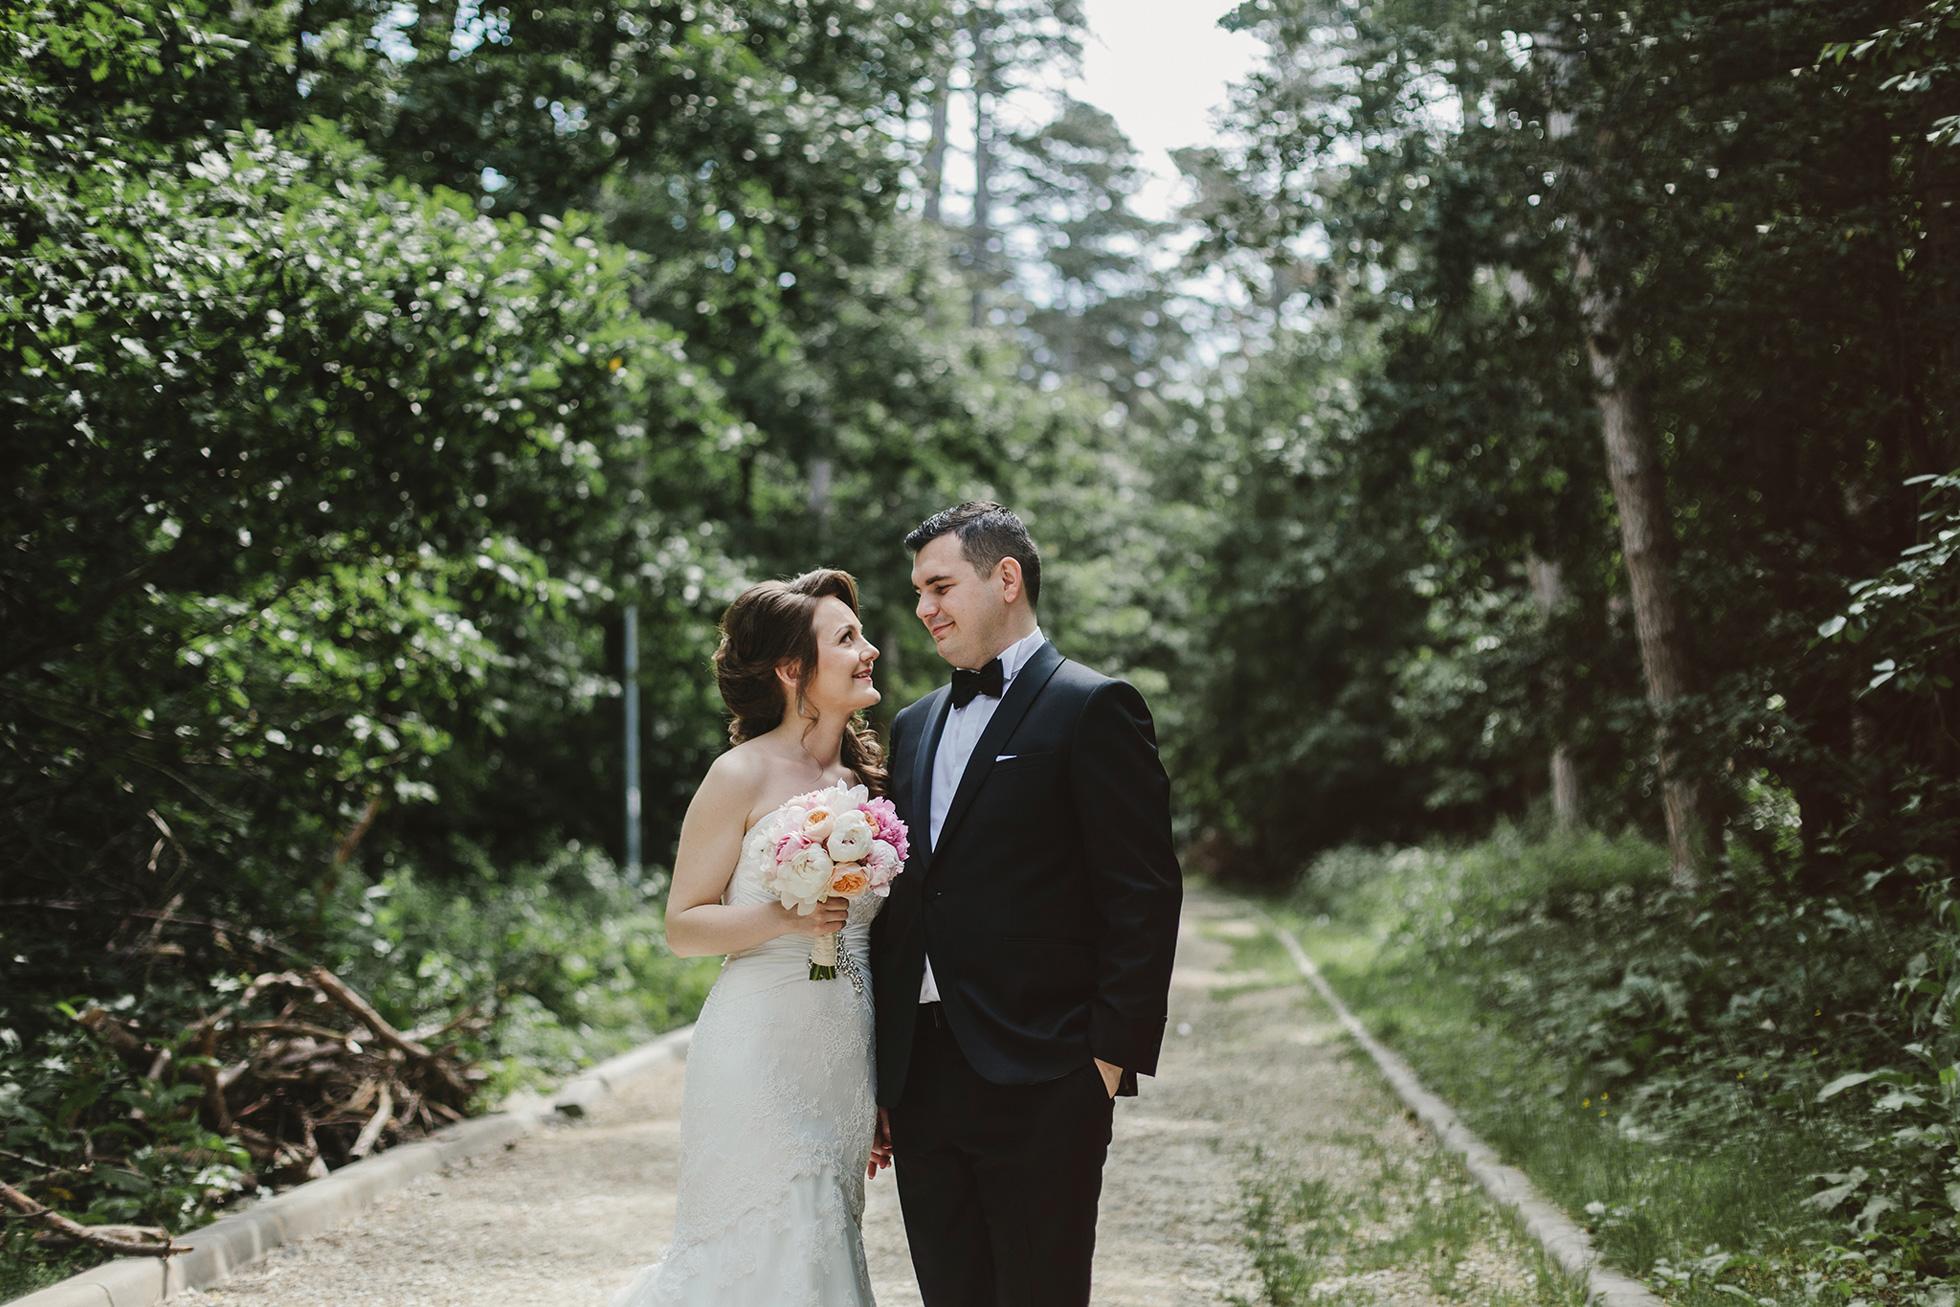 Liana-+-Florin-{wedding}-063